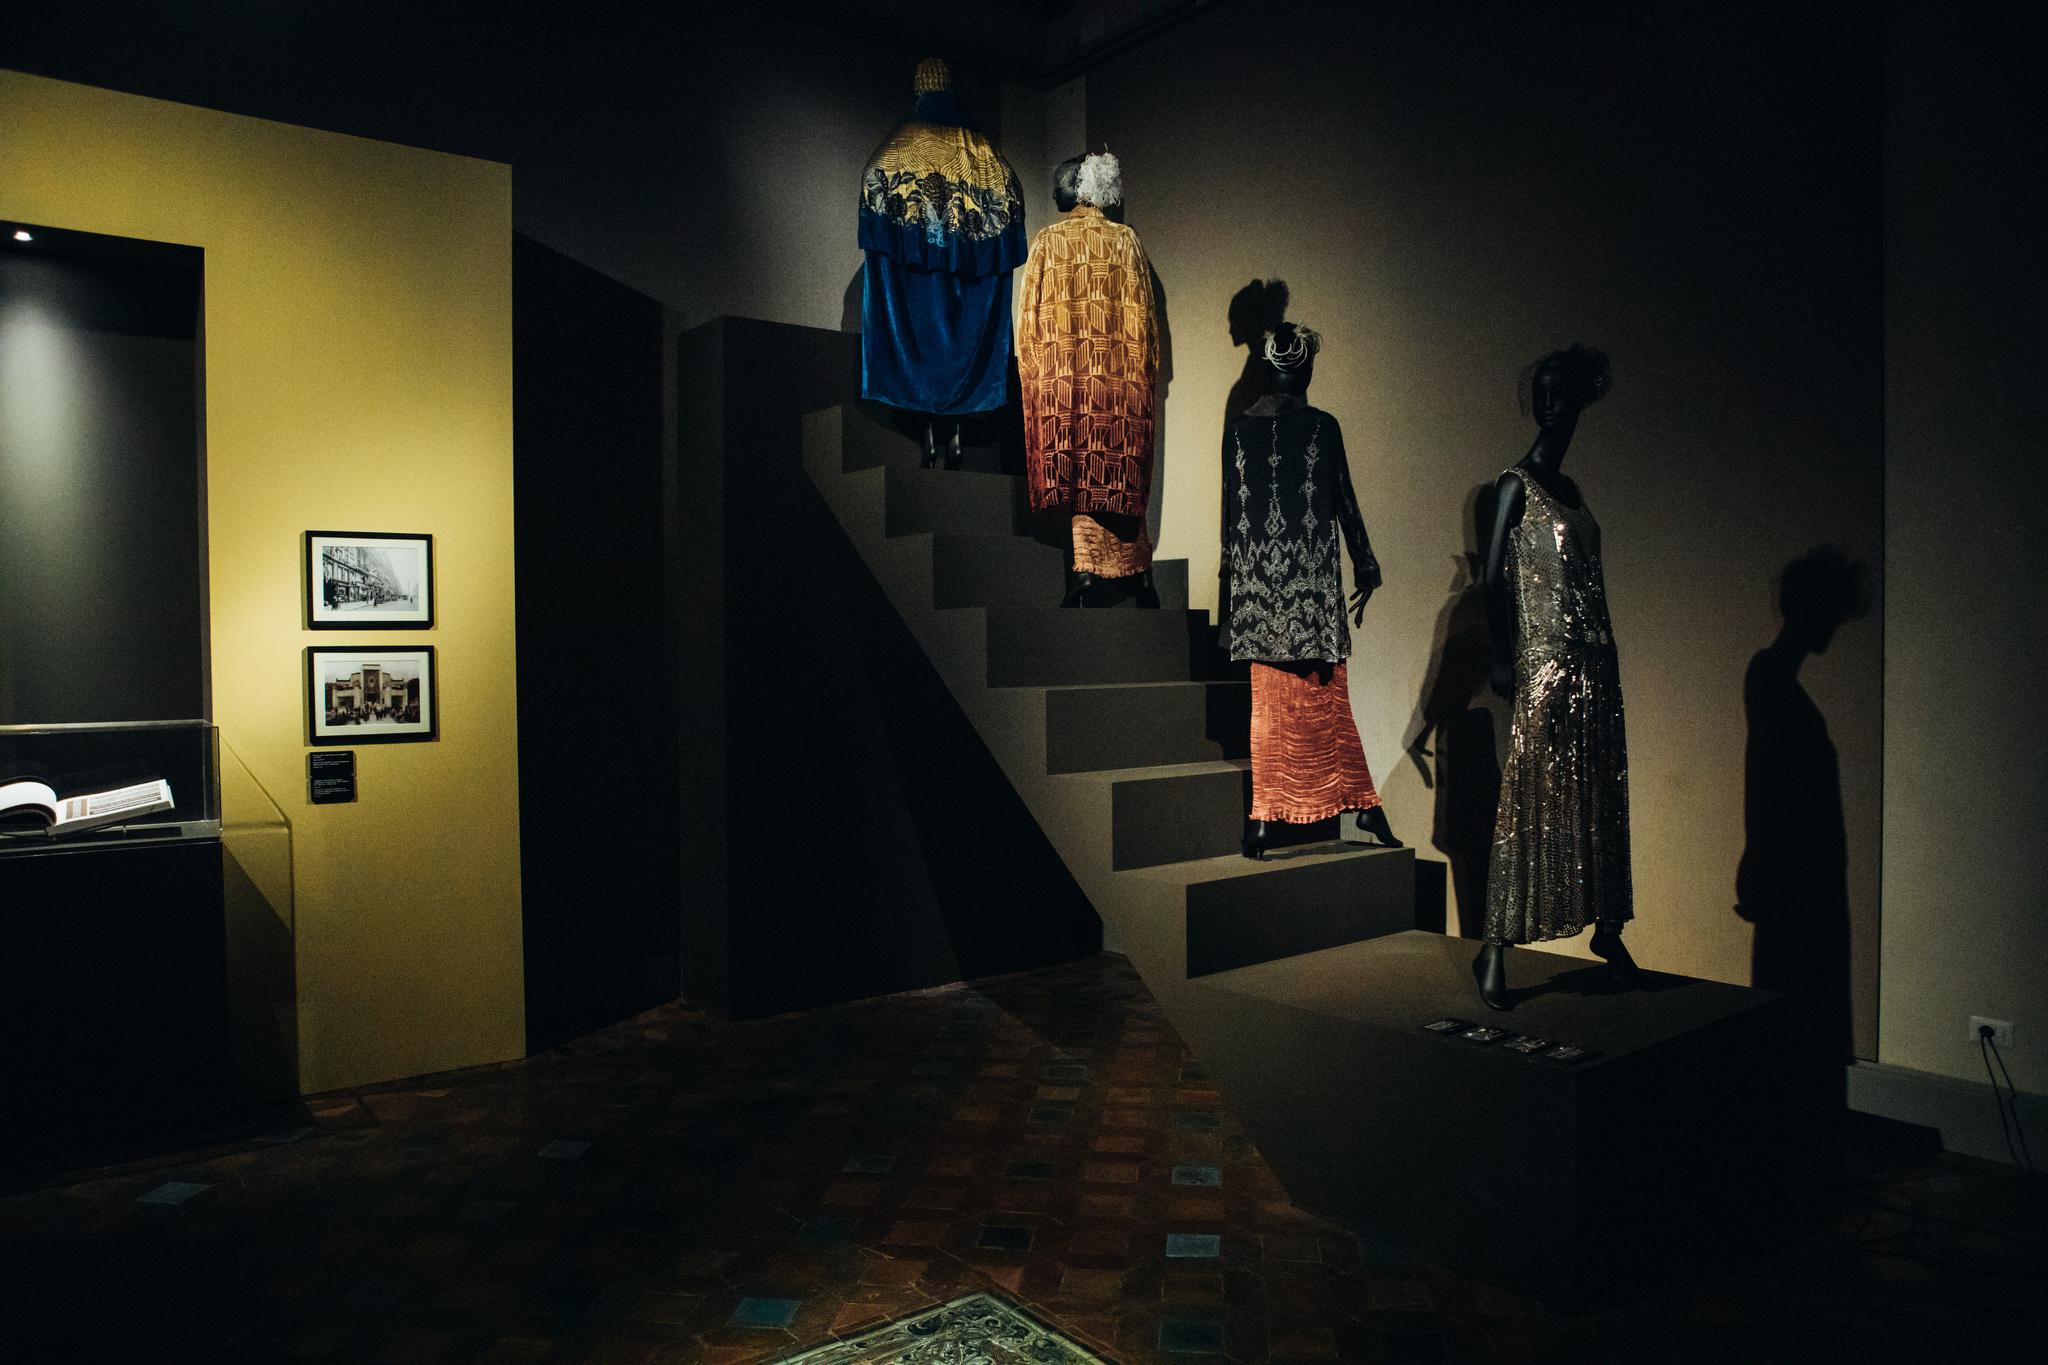 Atmosphere at the Bulgari exhibition.